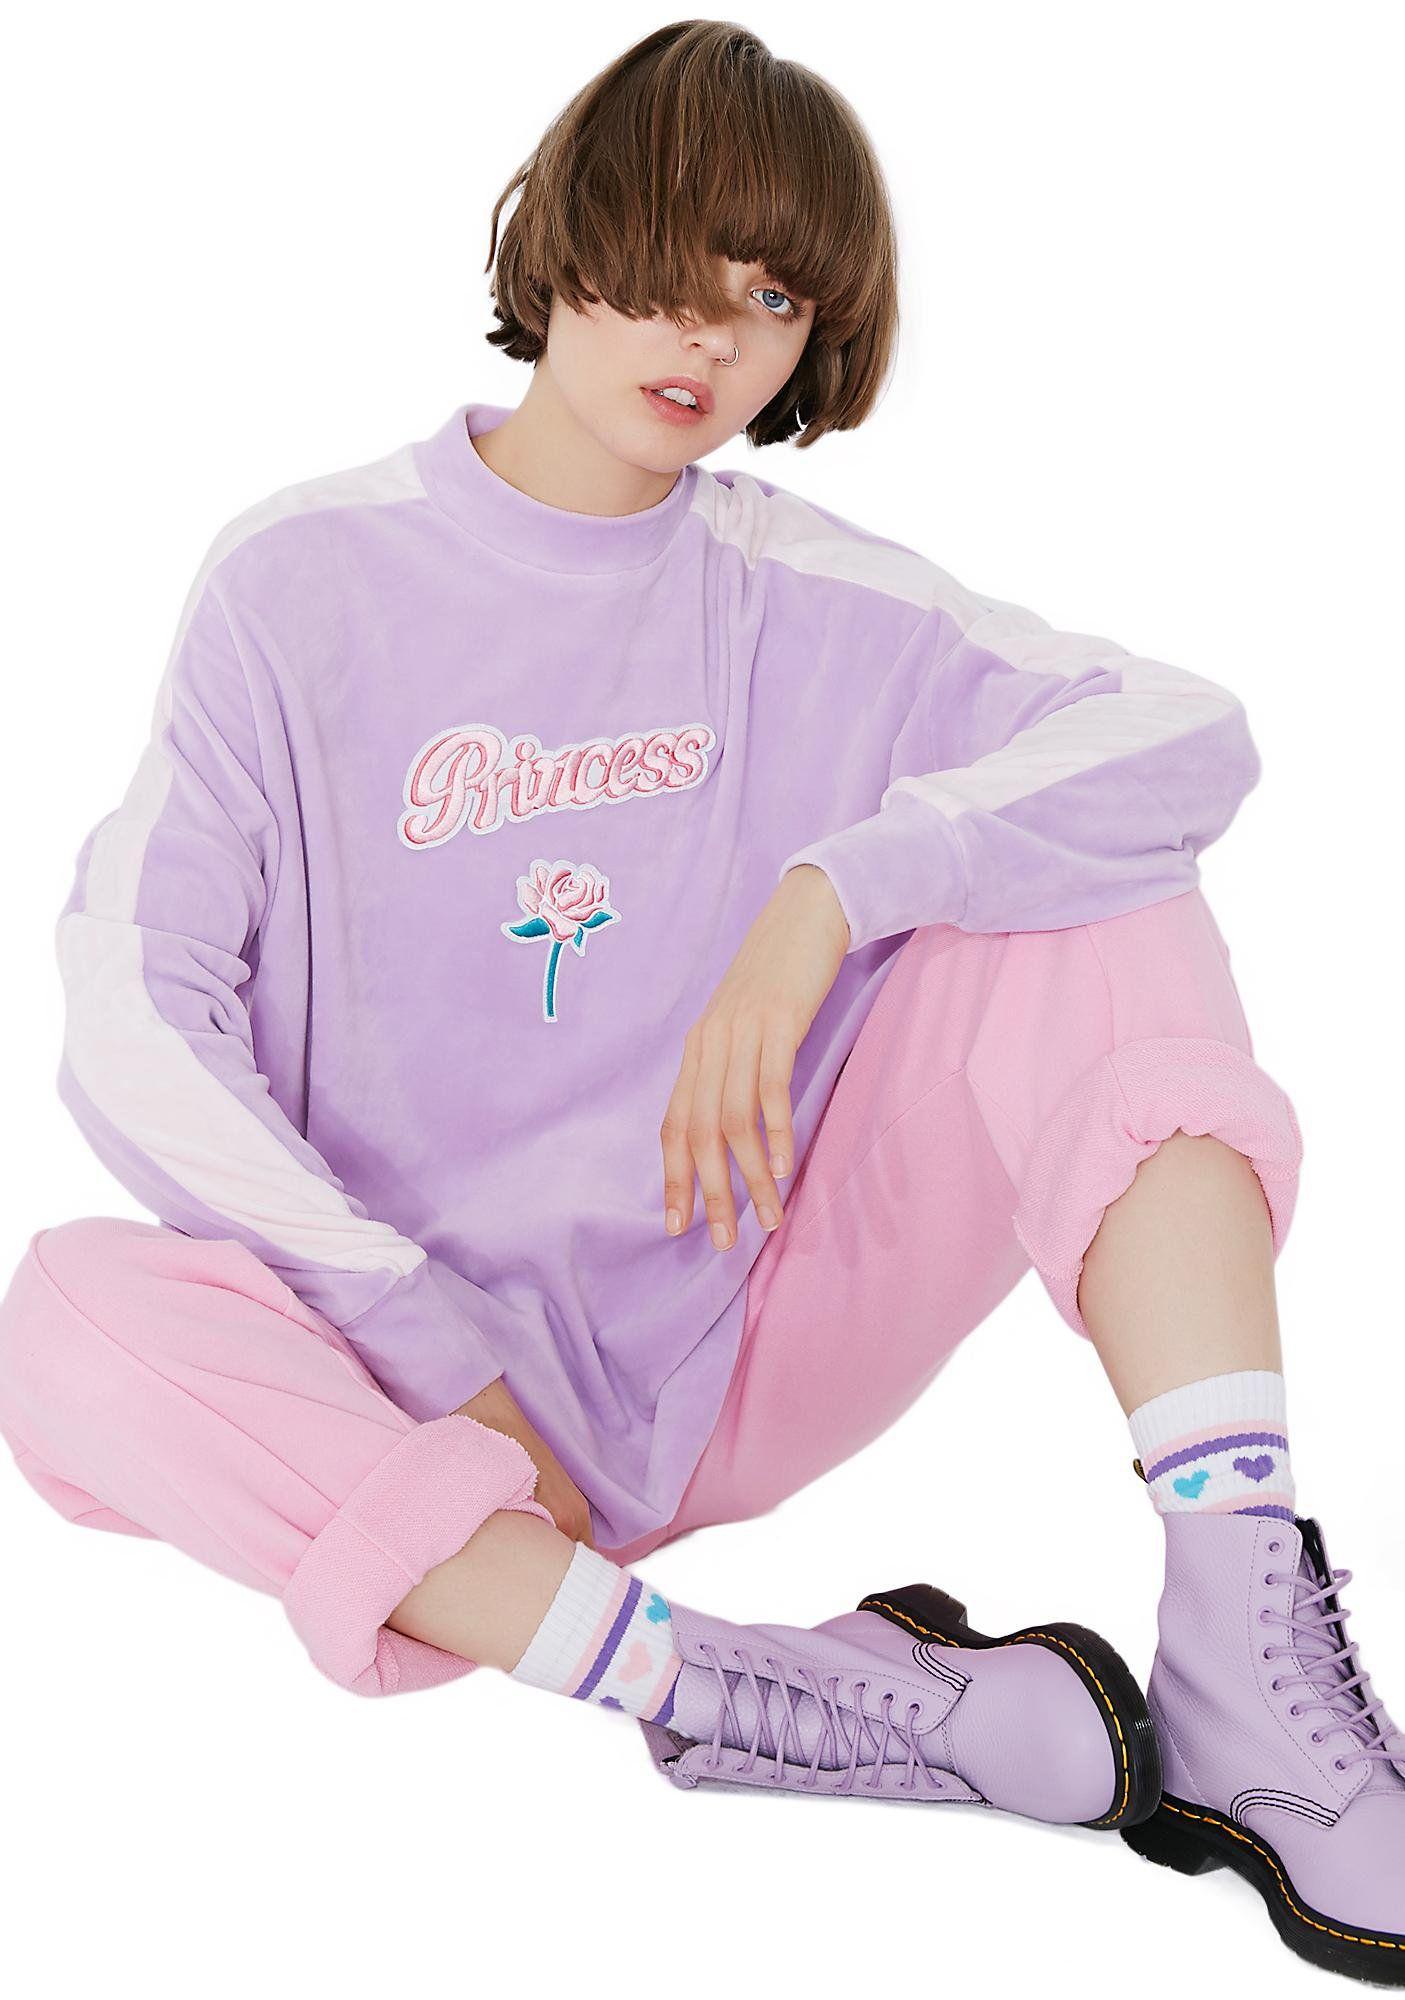 Princess velour sweatshirt lazy oaf sweatshirt and rose